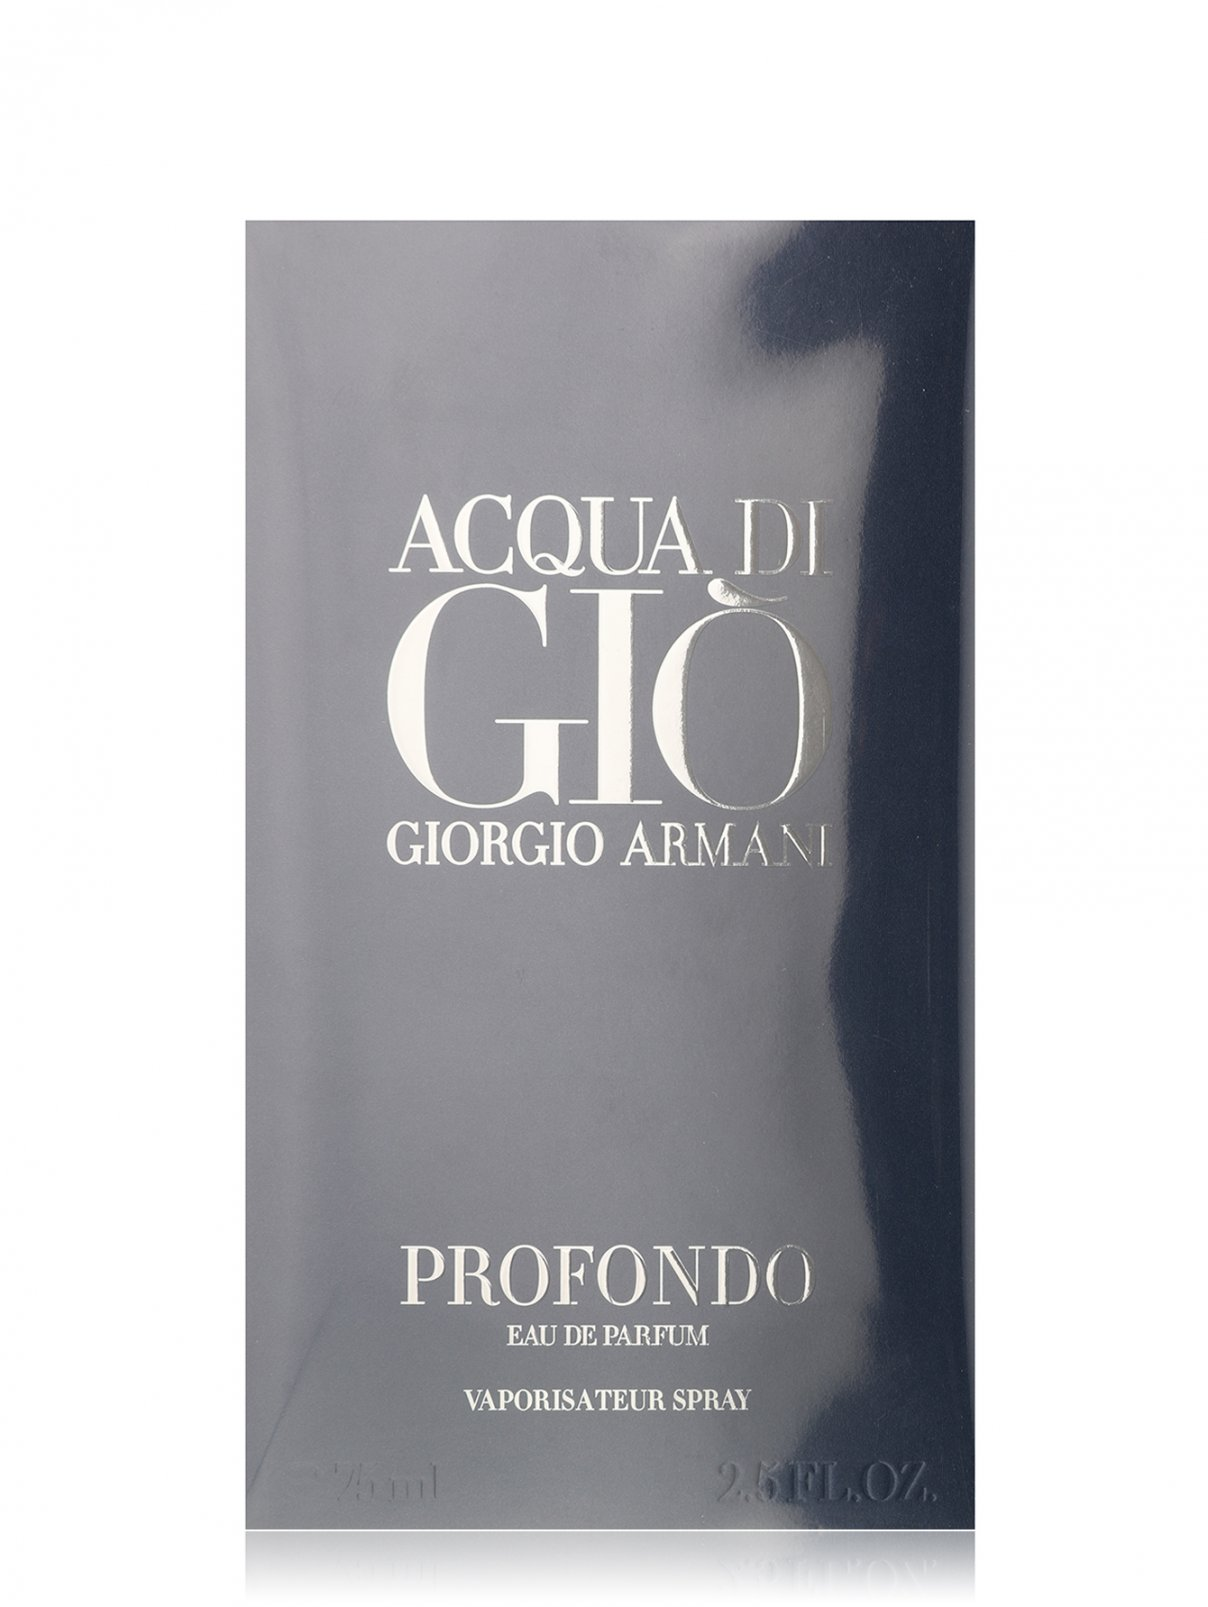 Парфюмерная вода Acqua di Gio Profondo, 75 мл Giorgio Armani  –  Общий вид